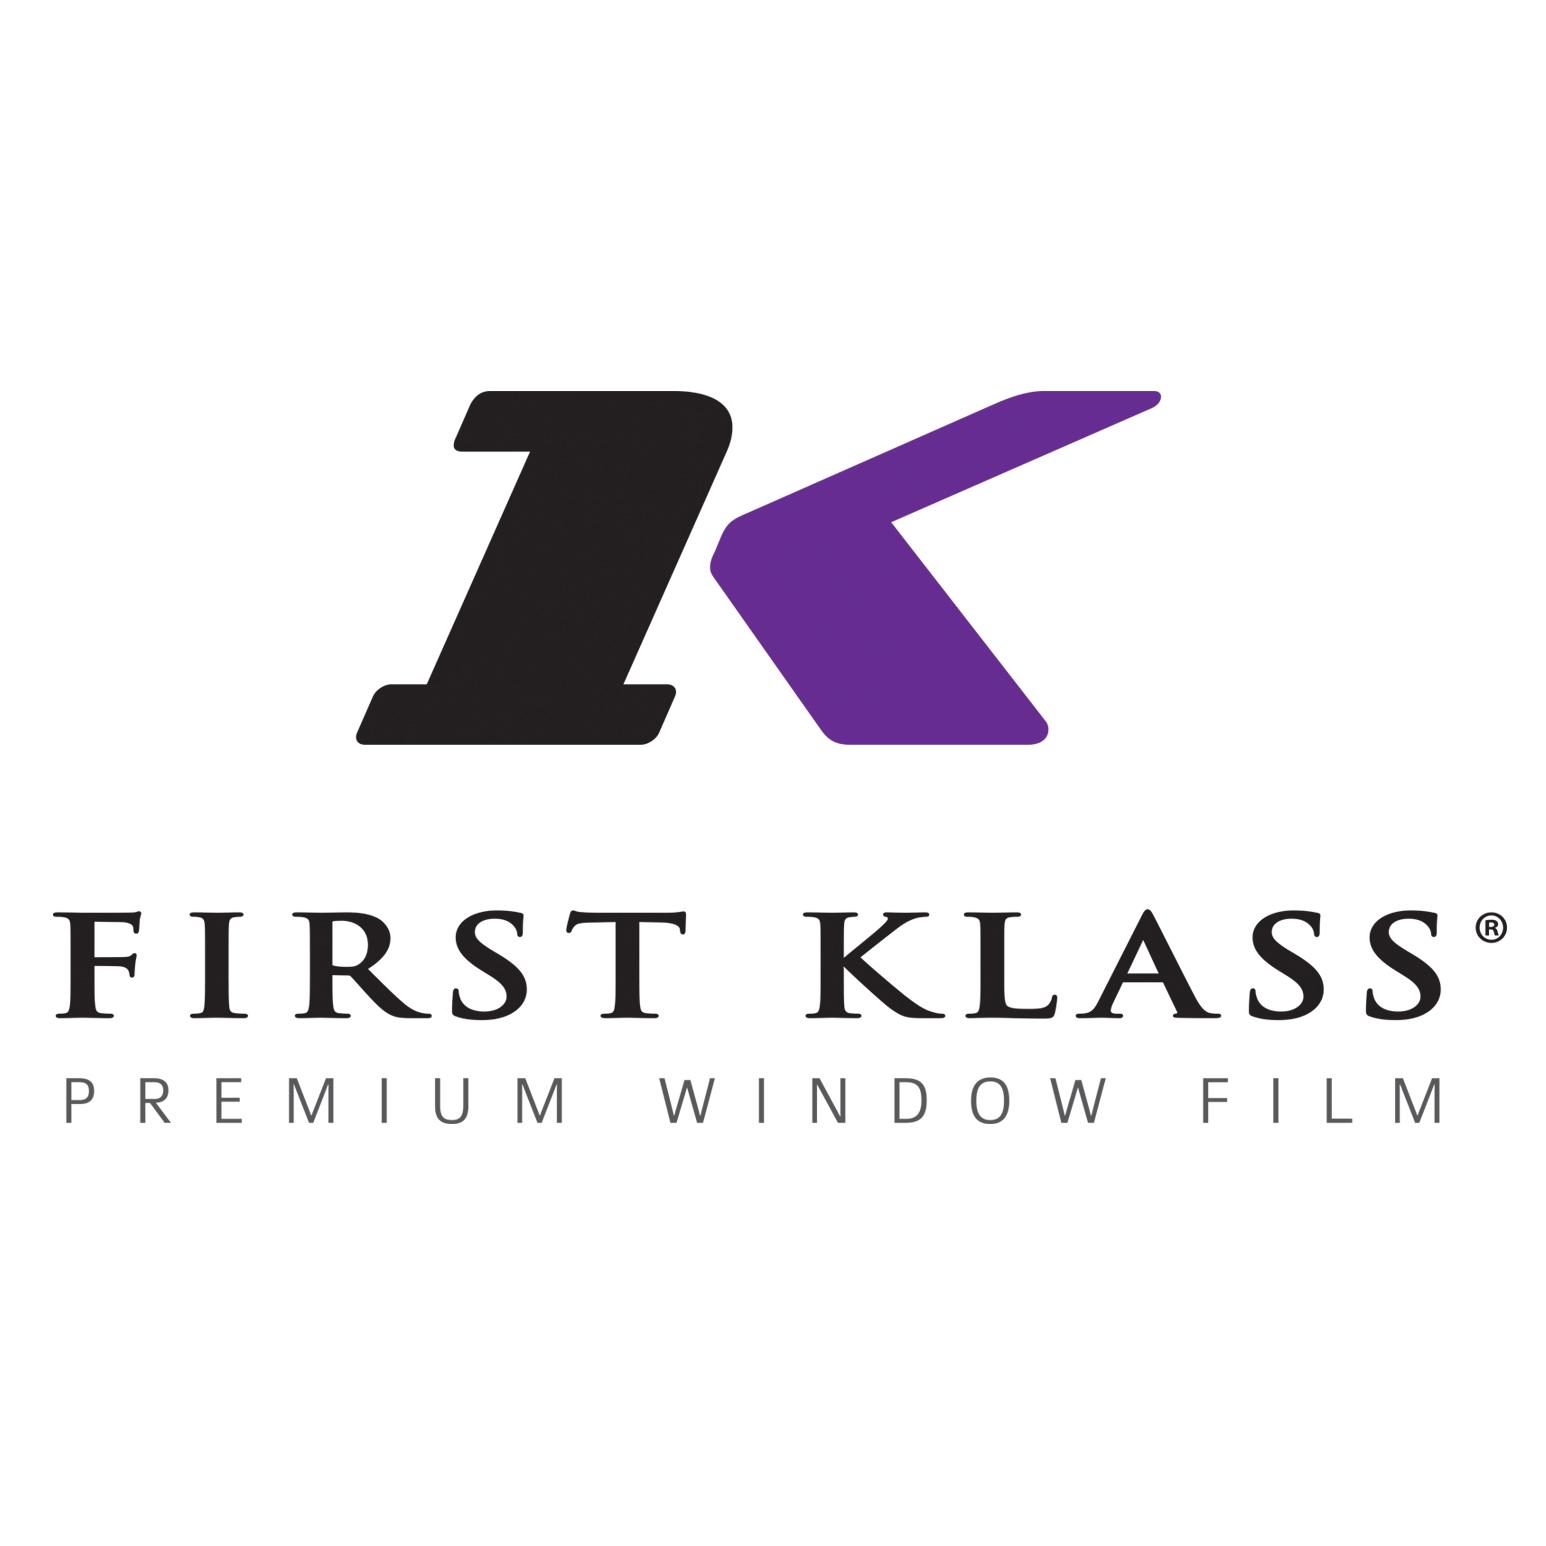 Jual First Klass Voucher Kaca Film Idr 5 Juta Terbaru Harga Indomaret Rp 5000000